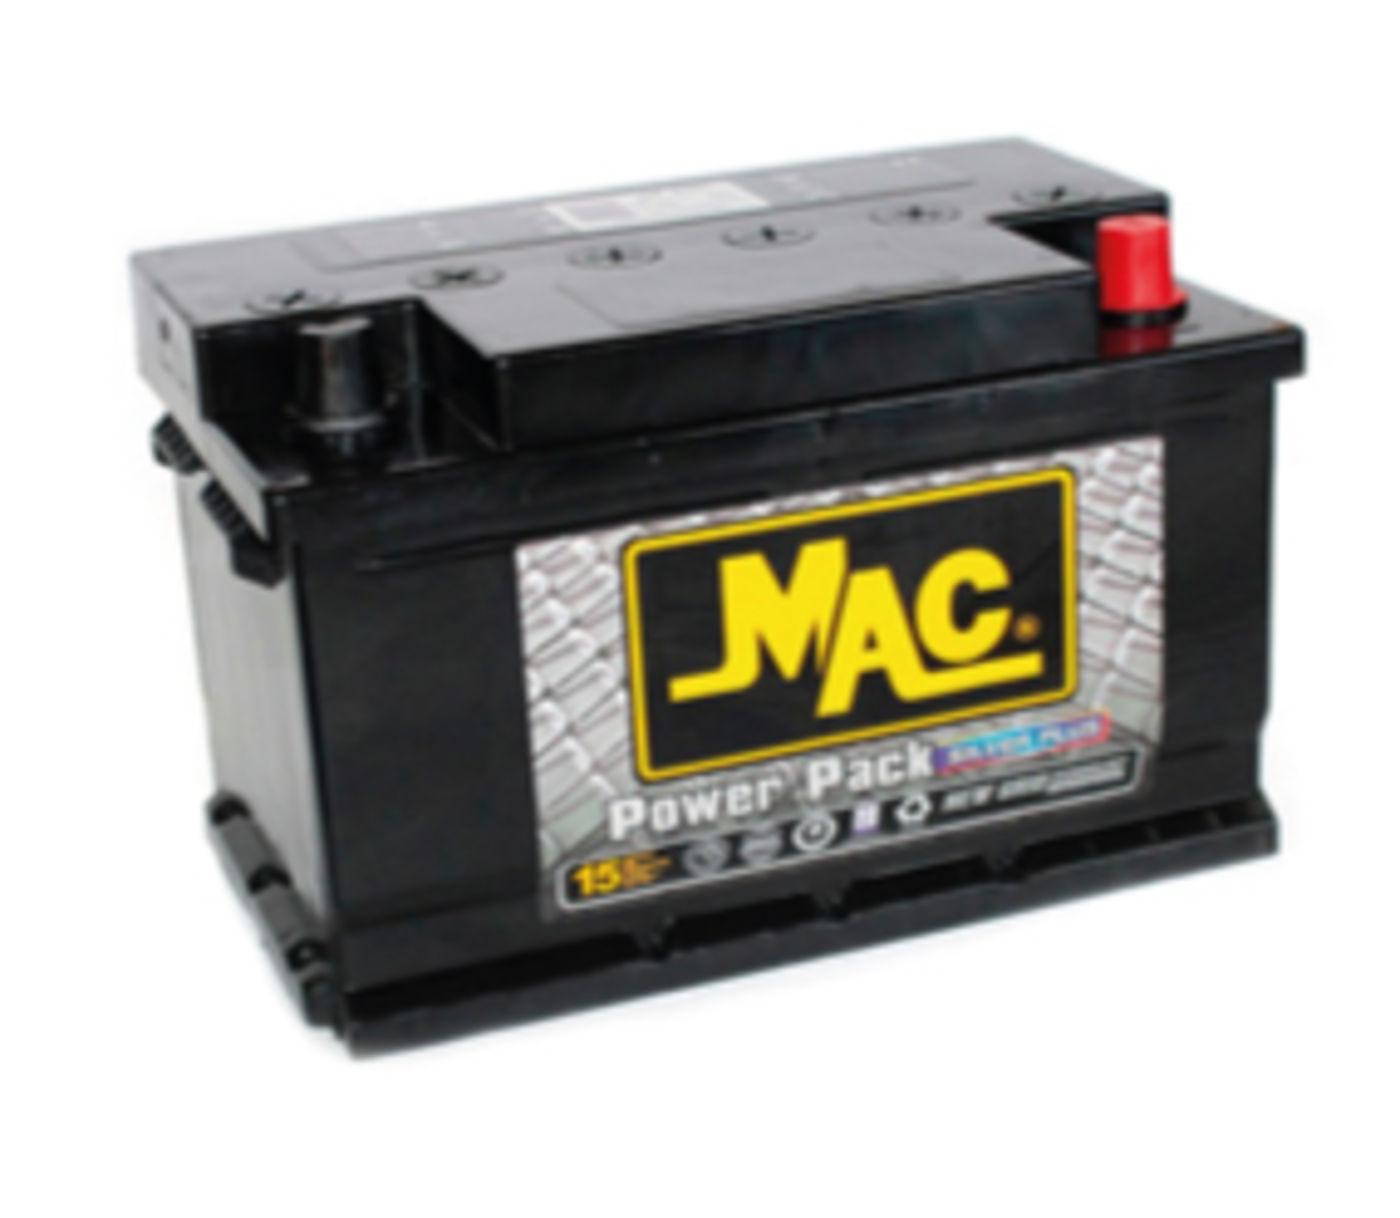 Mac 47R700M